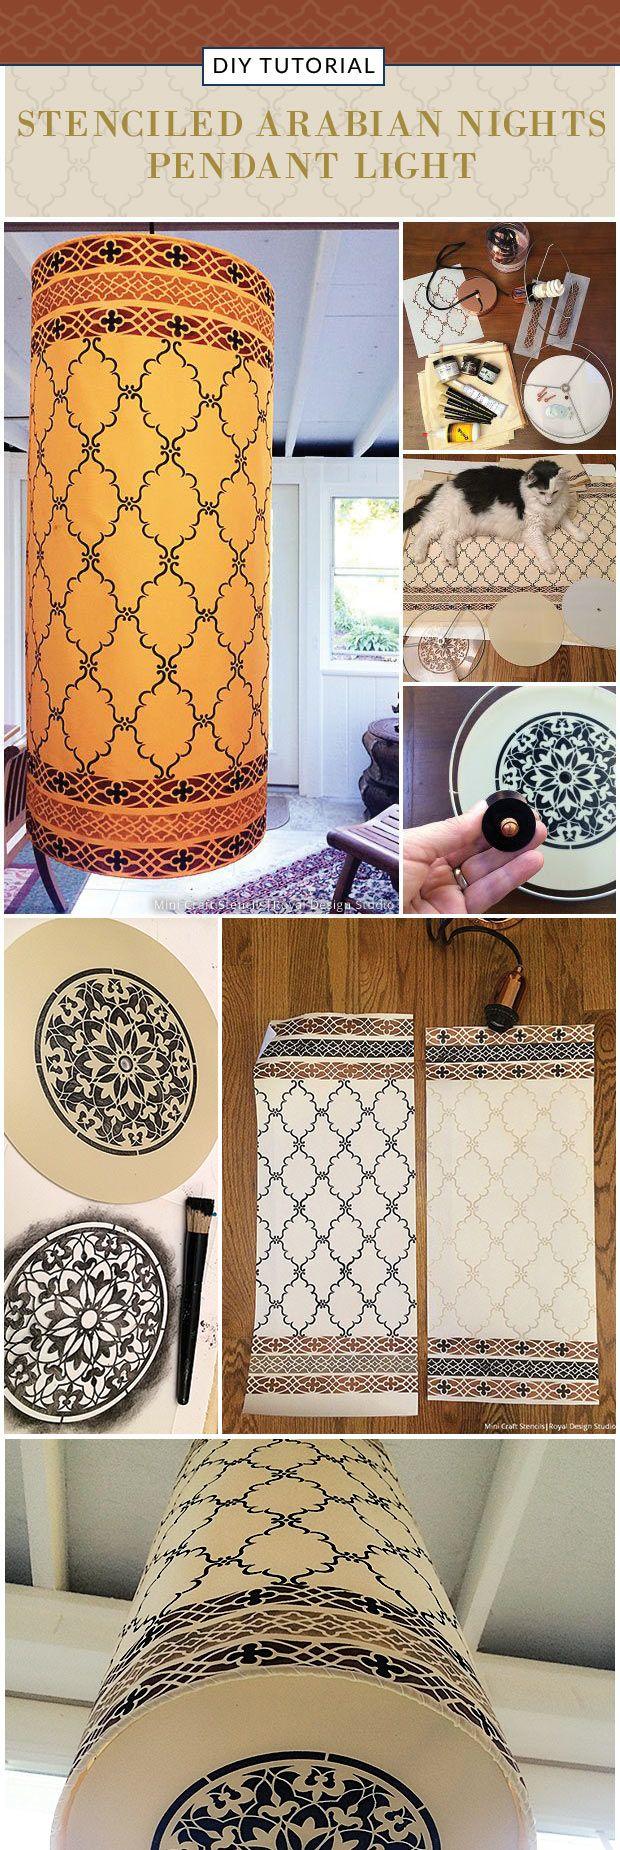 DIY Tutorial - Stenciled Arabian Nights Pendant Light using Royal Design Studio Craft Stencils